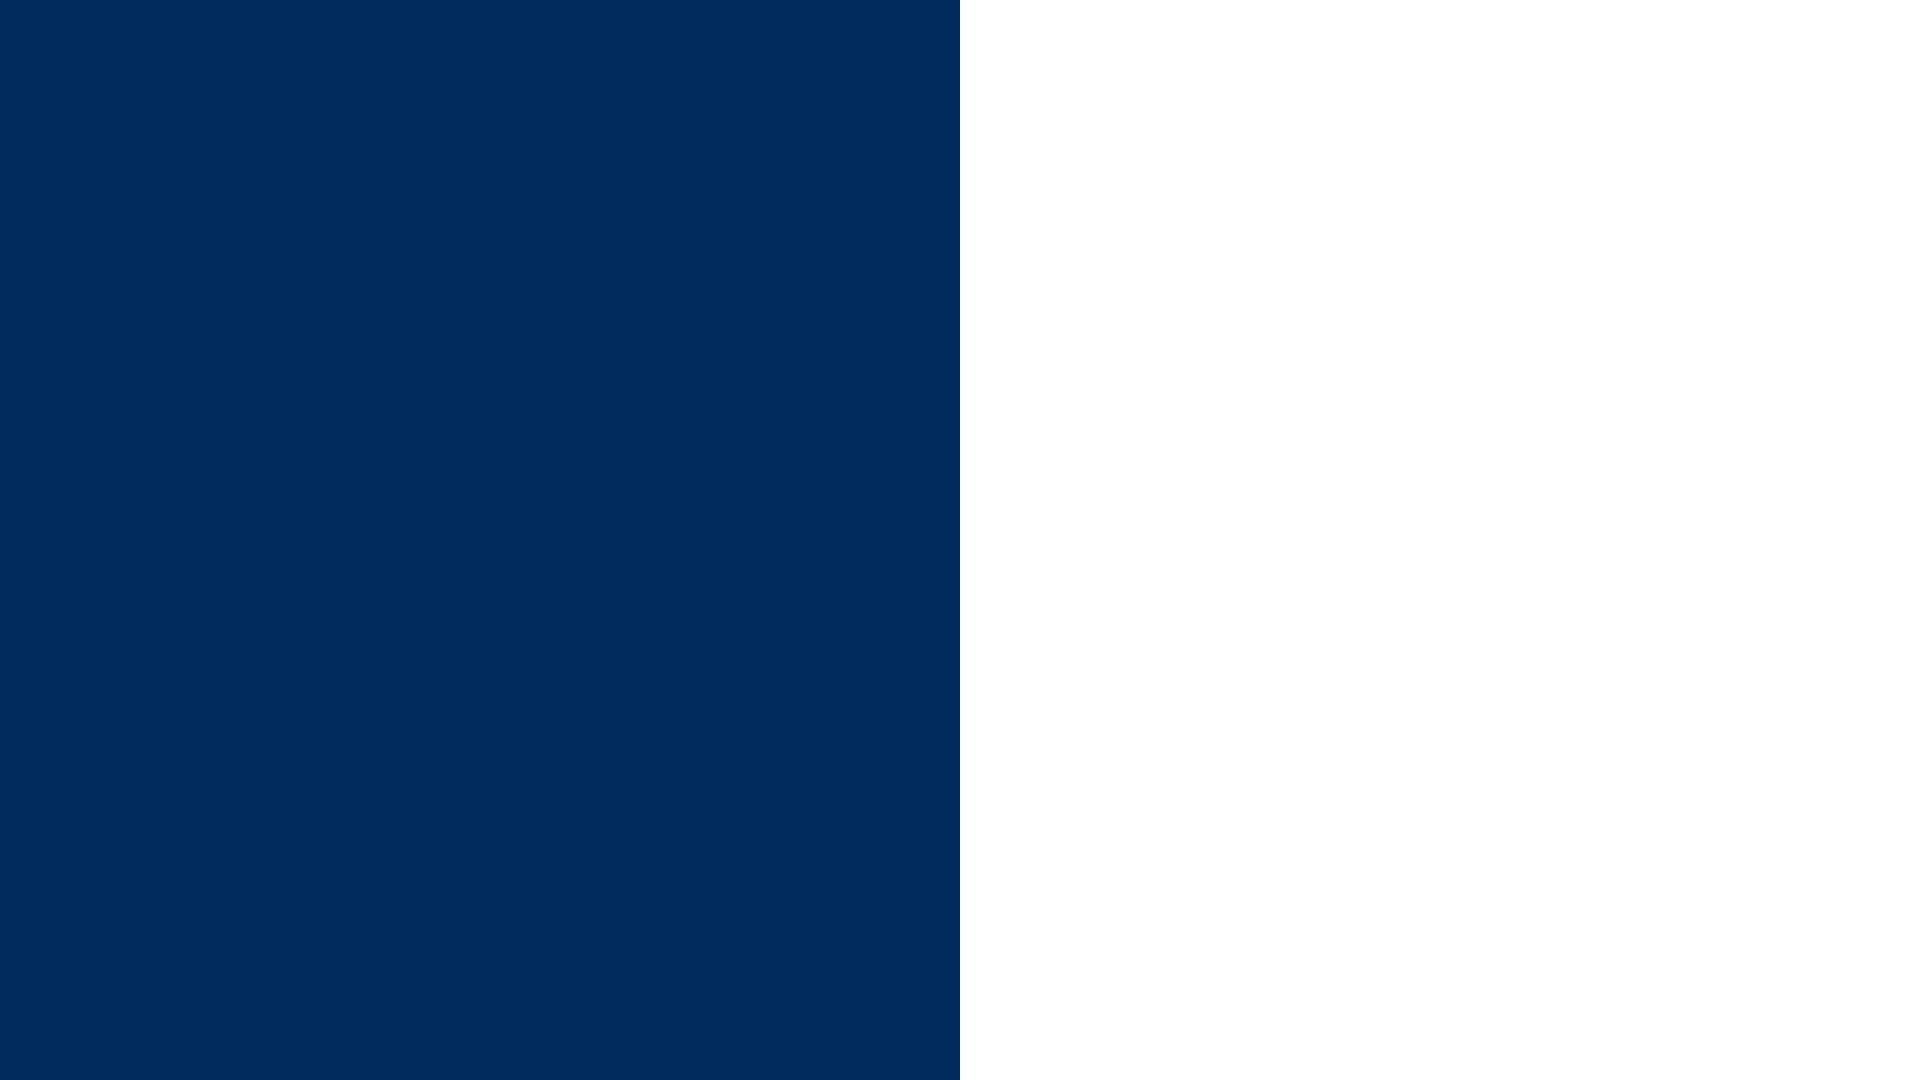 Geelong Football Club Logo Color Scheme Blue Schemecolor Com